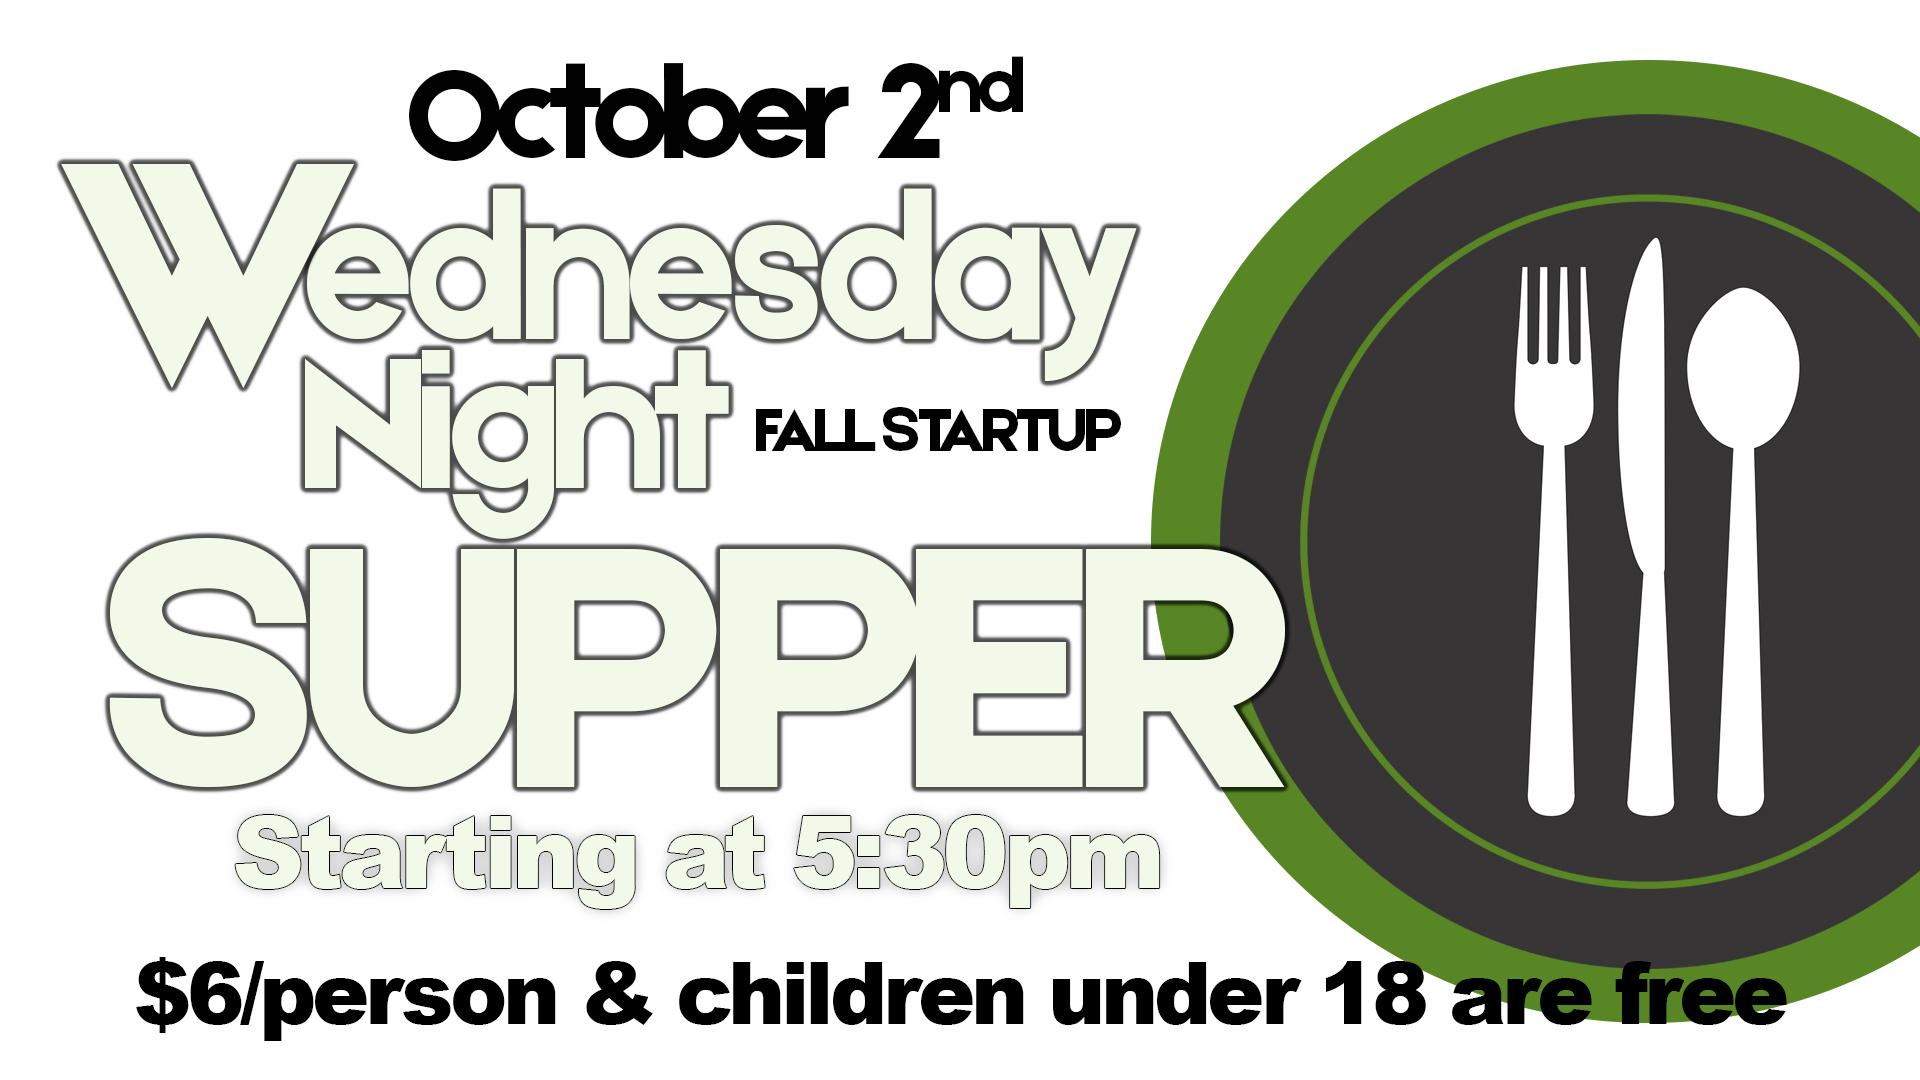 Wednesday Night Supper Fall Startup.jpg